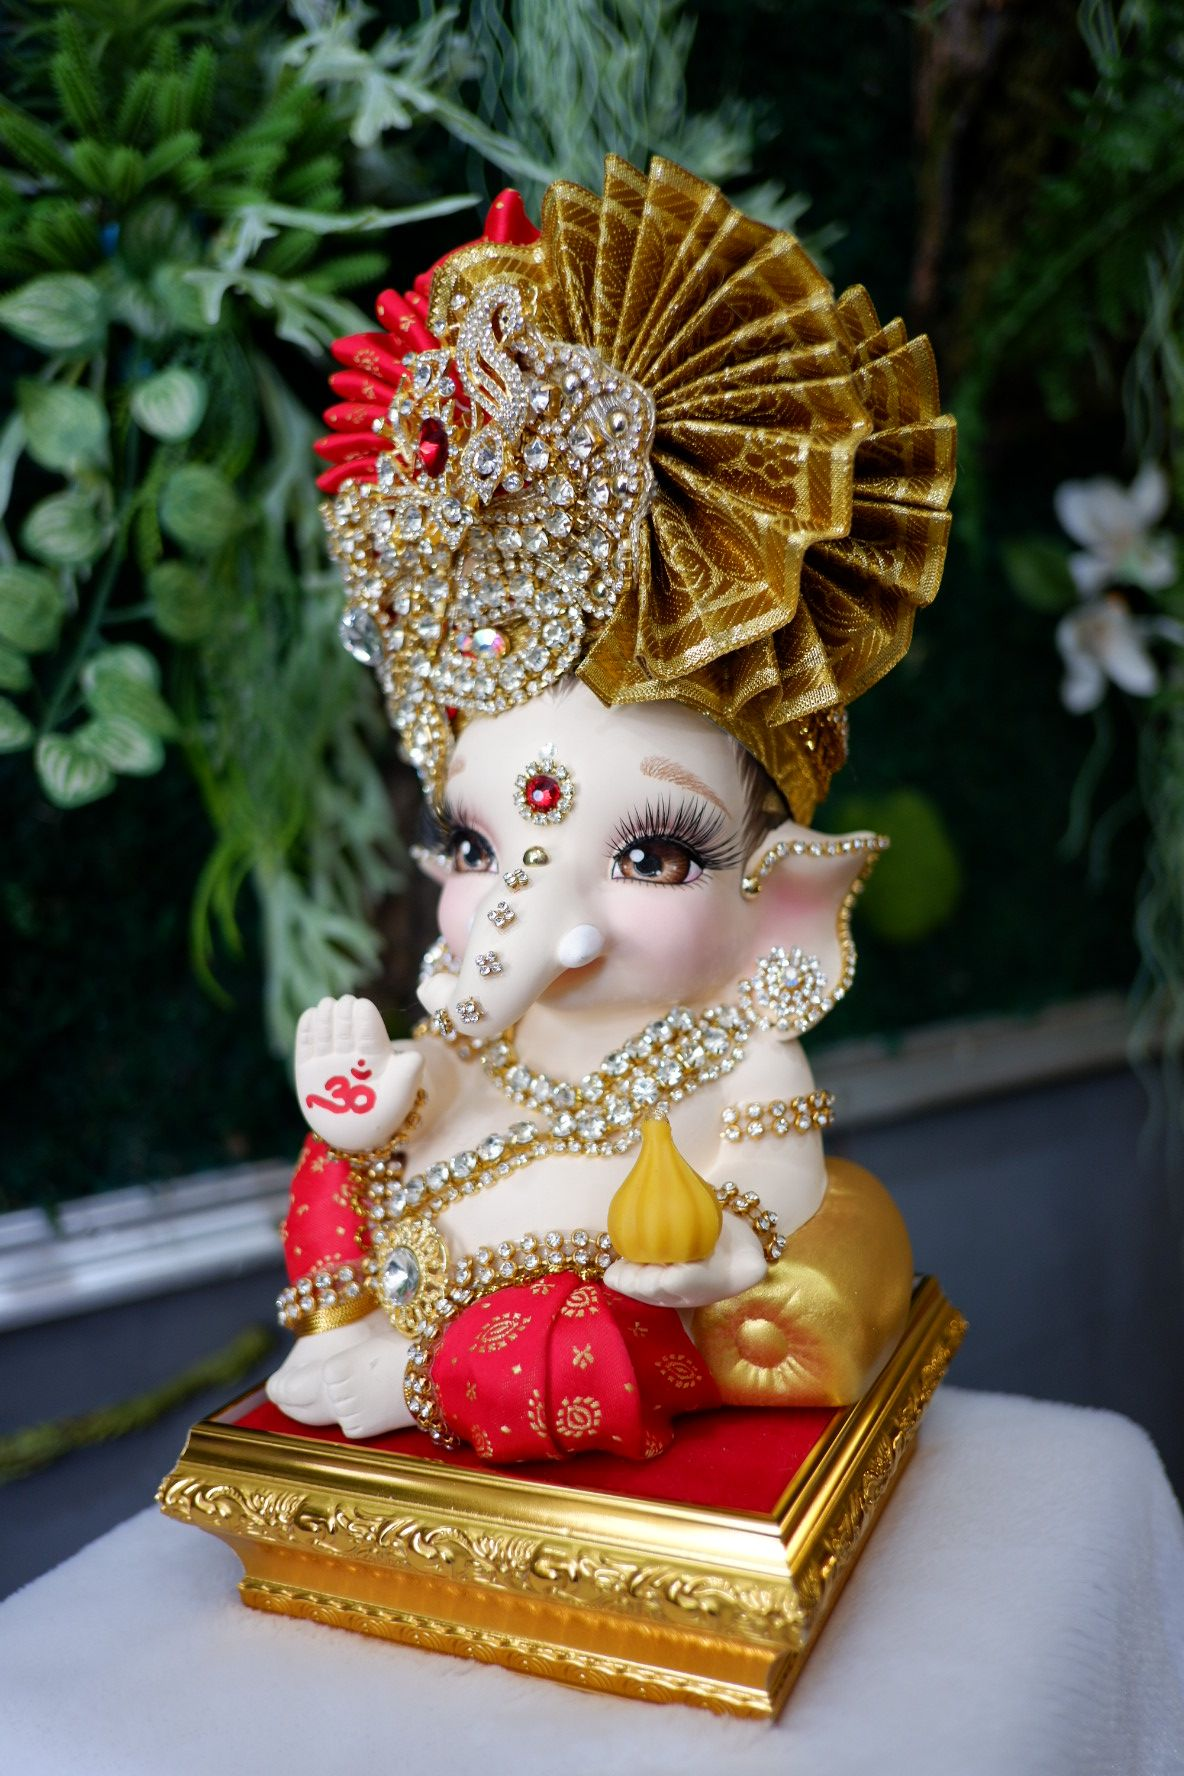 Pin By Sakshi Saini On Ganesha Baby Ganesha Ganesha Hindu Happy Ganesh Chaturthi